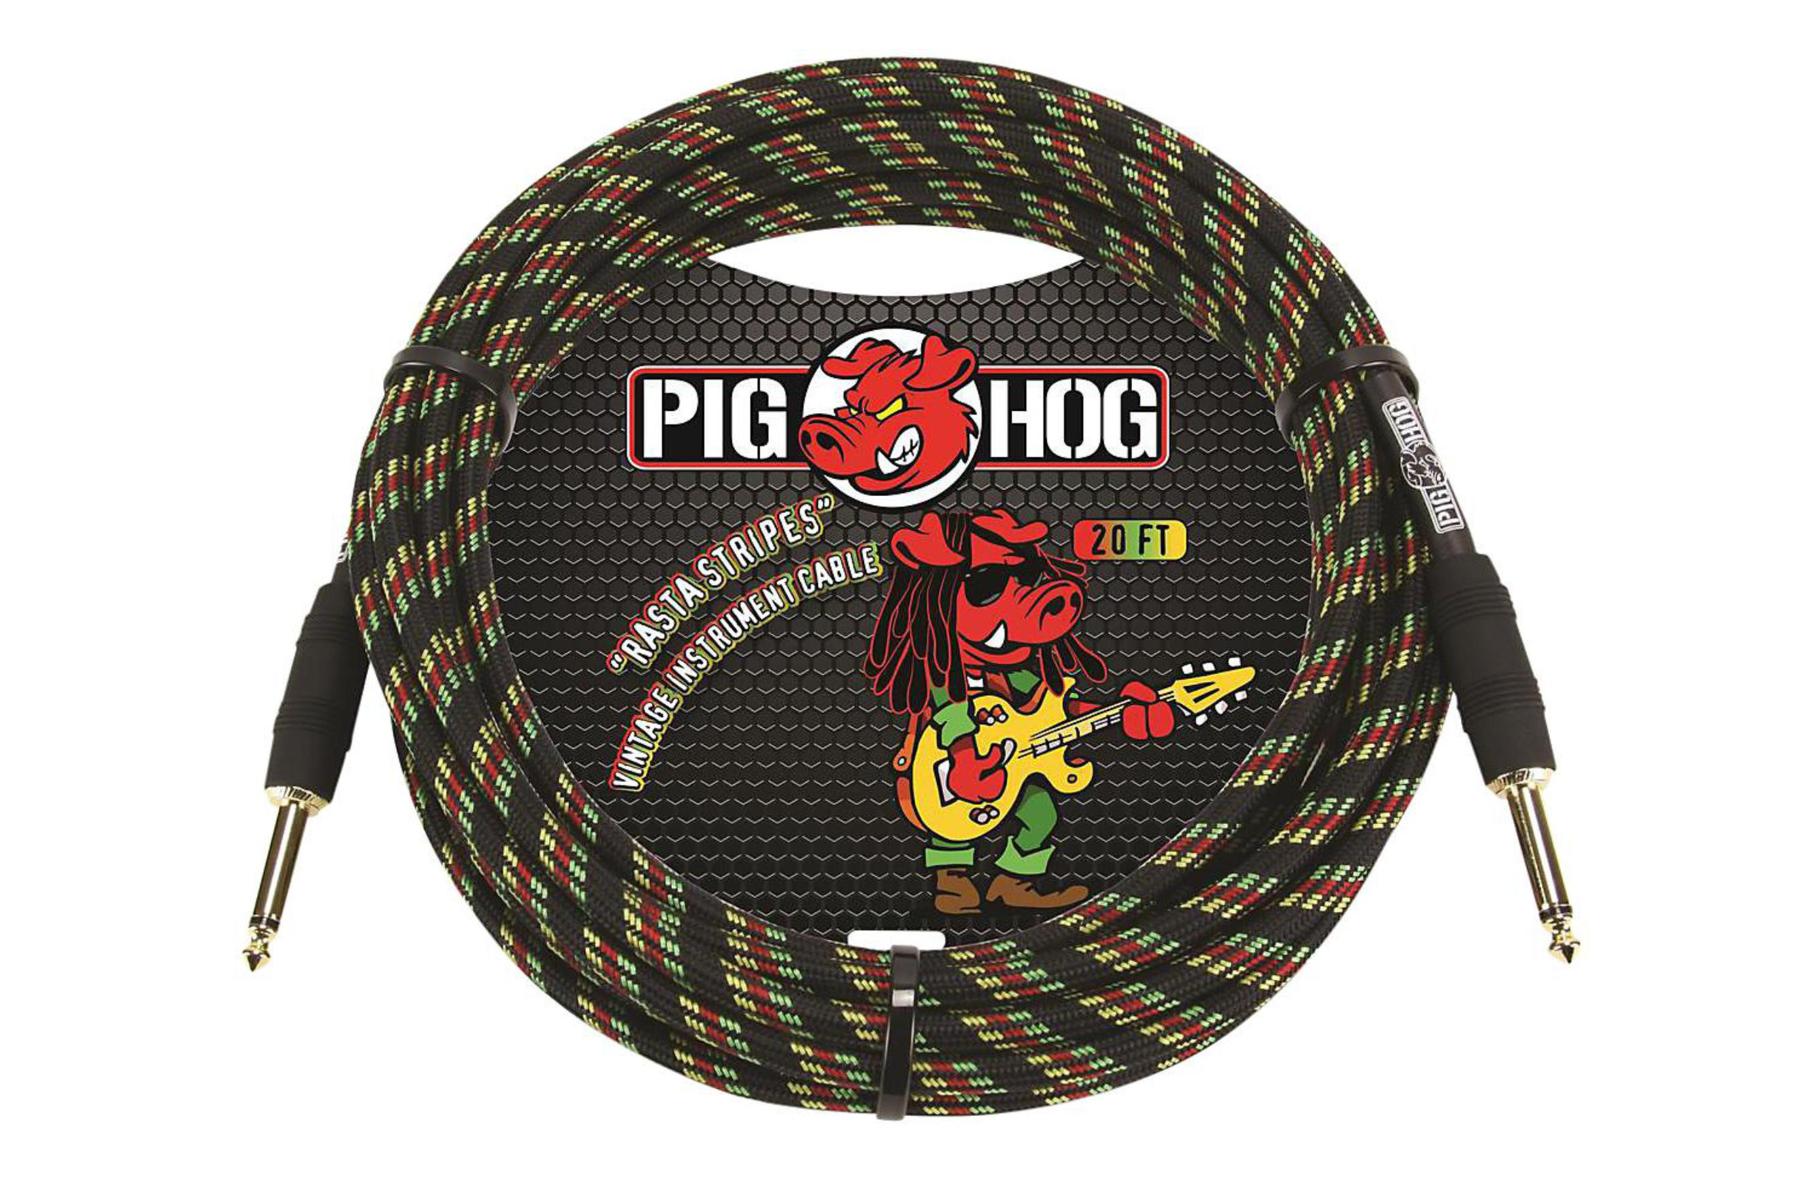 Pig Hog 20ft Rasta Instrument Cable